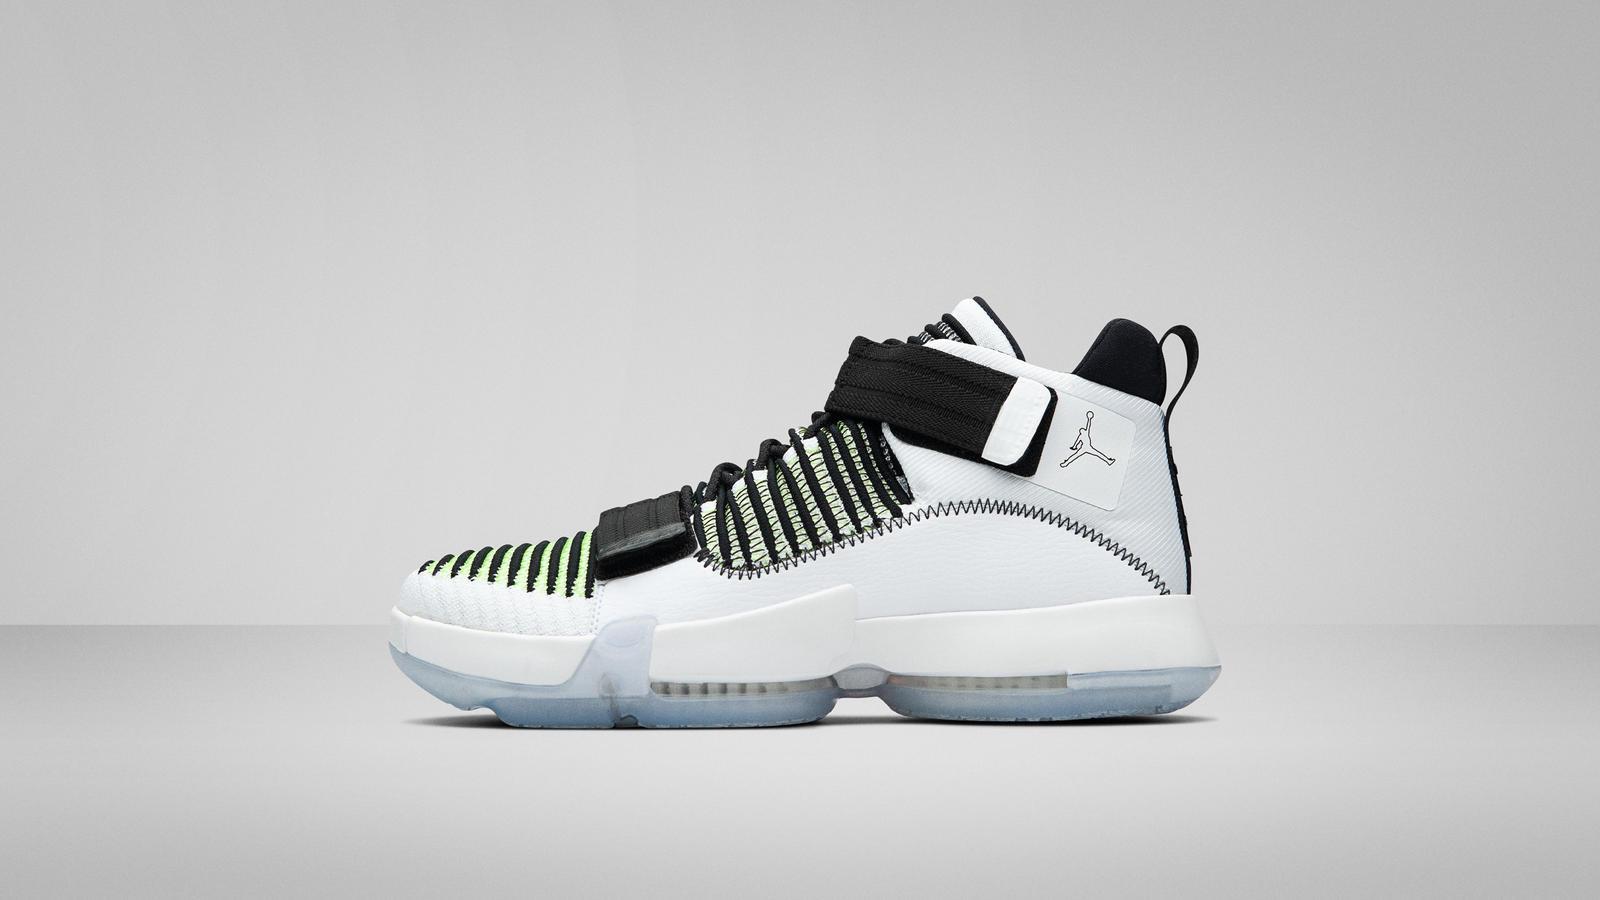 Nikenews featuredfootwear jordansupremeelevation 4.11.19 1649 hd 1600